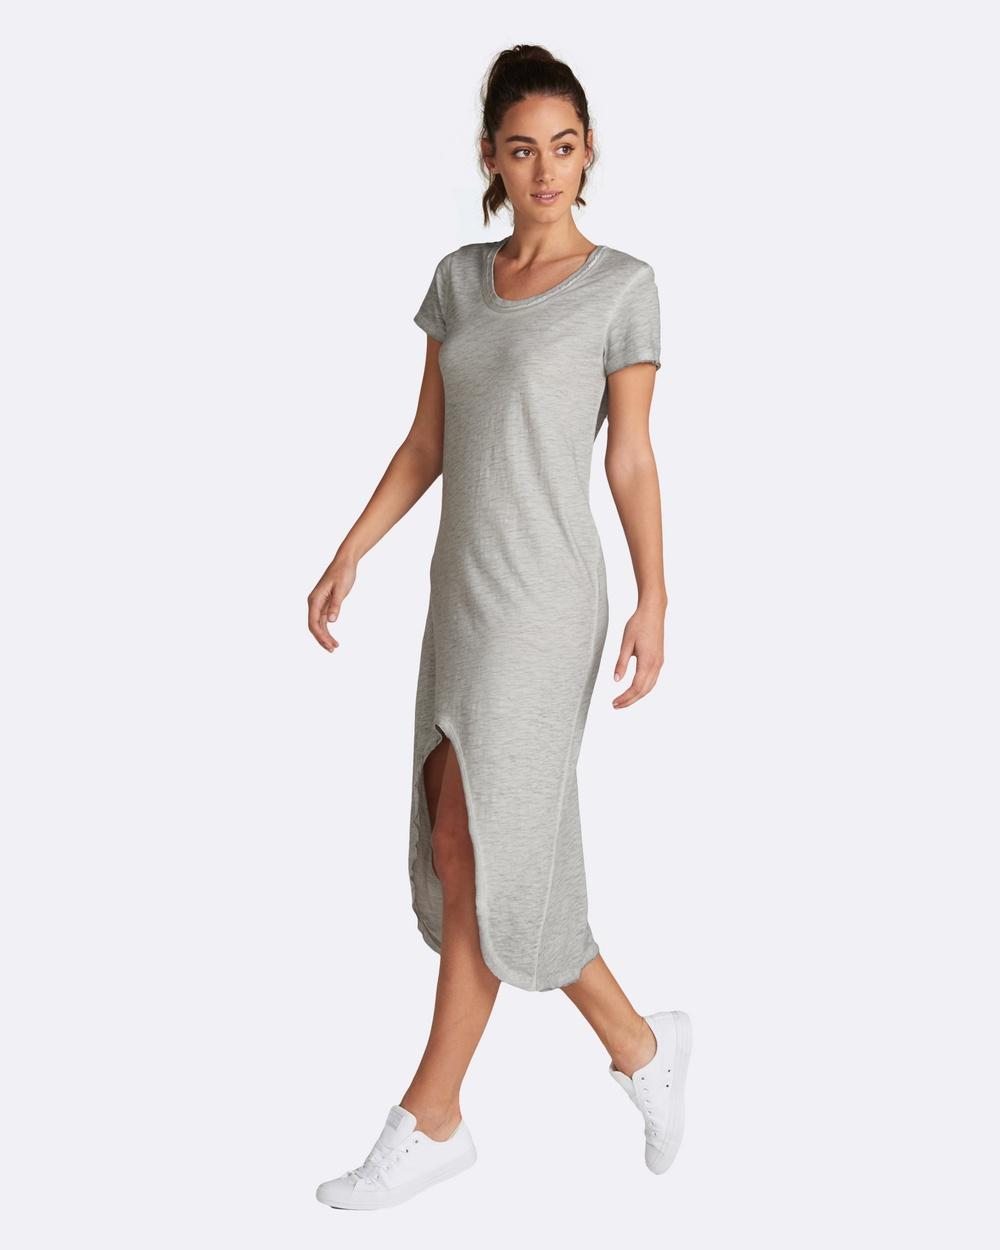 jac + mooki Maisie Dress Dresses Grey Maisie Dress